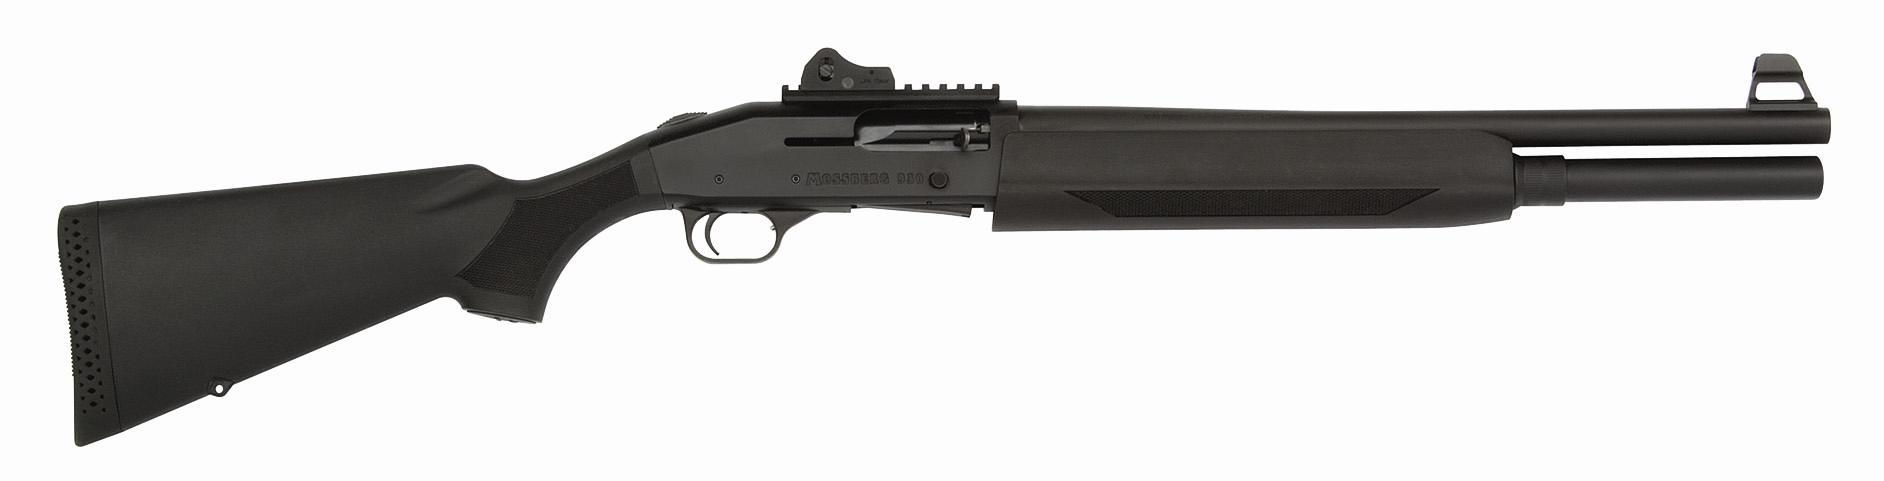 Mossberg 930SPX